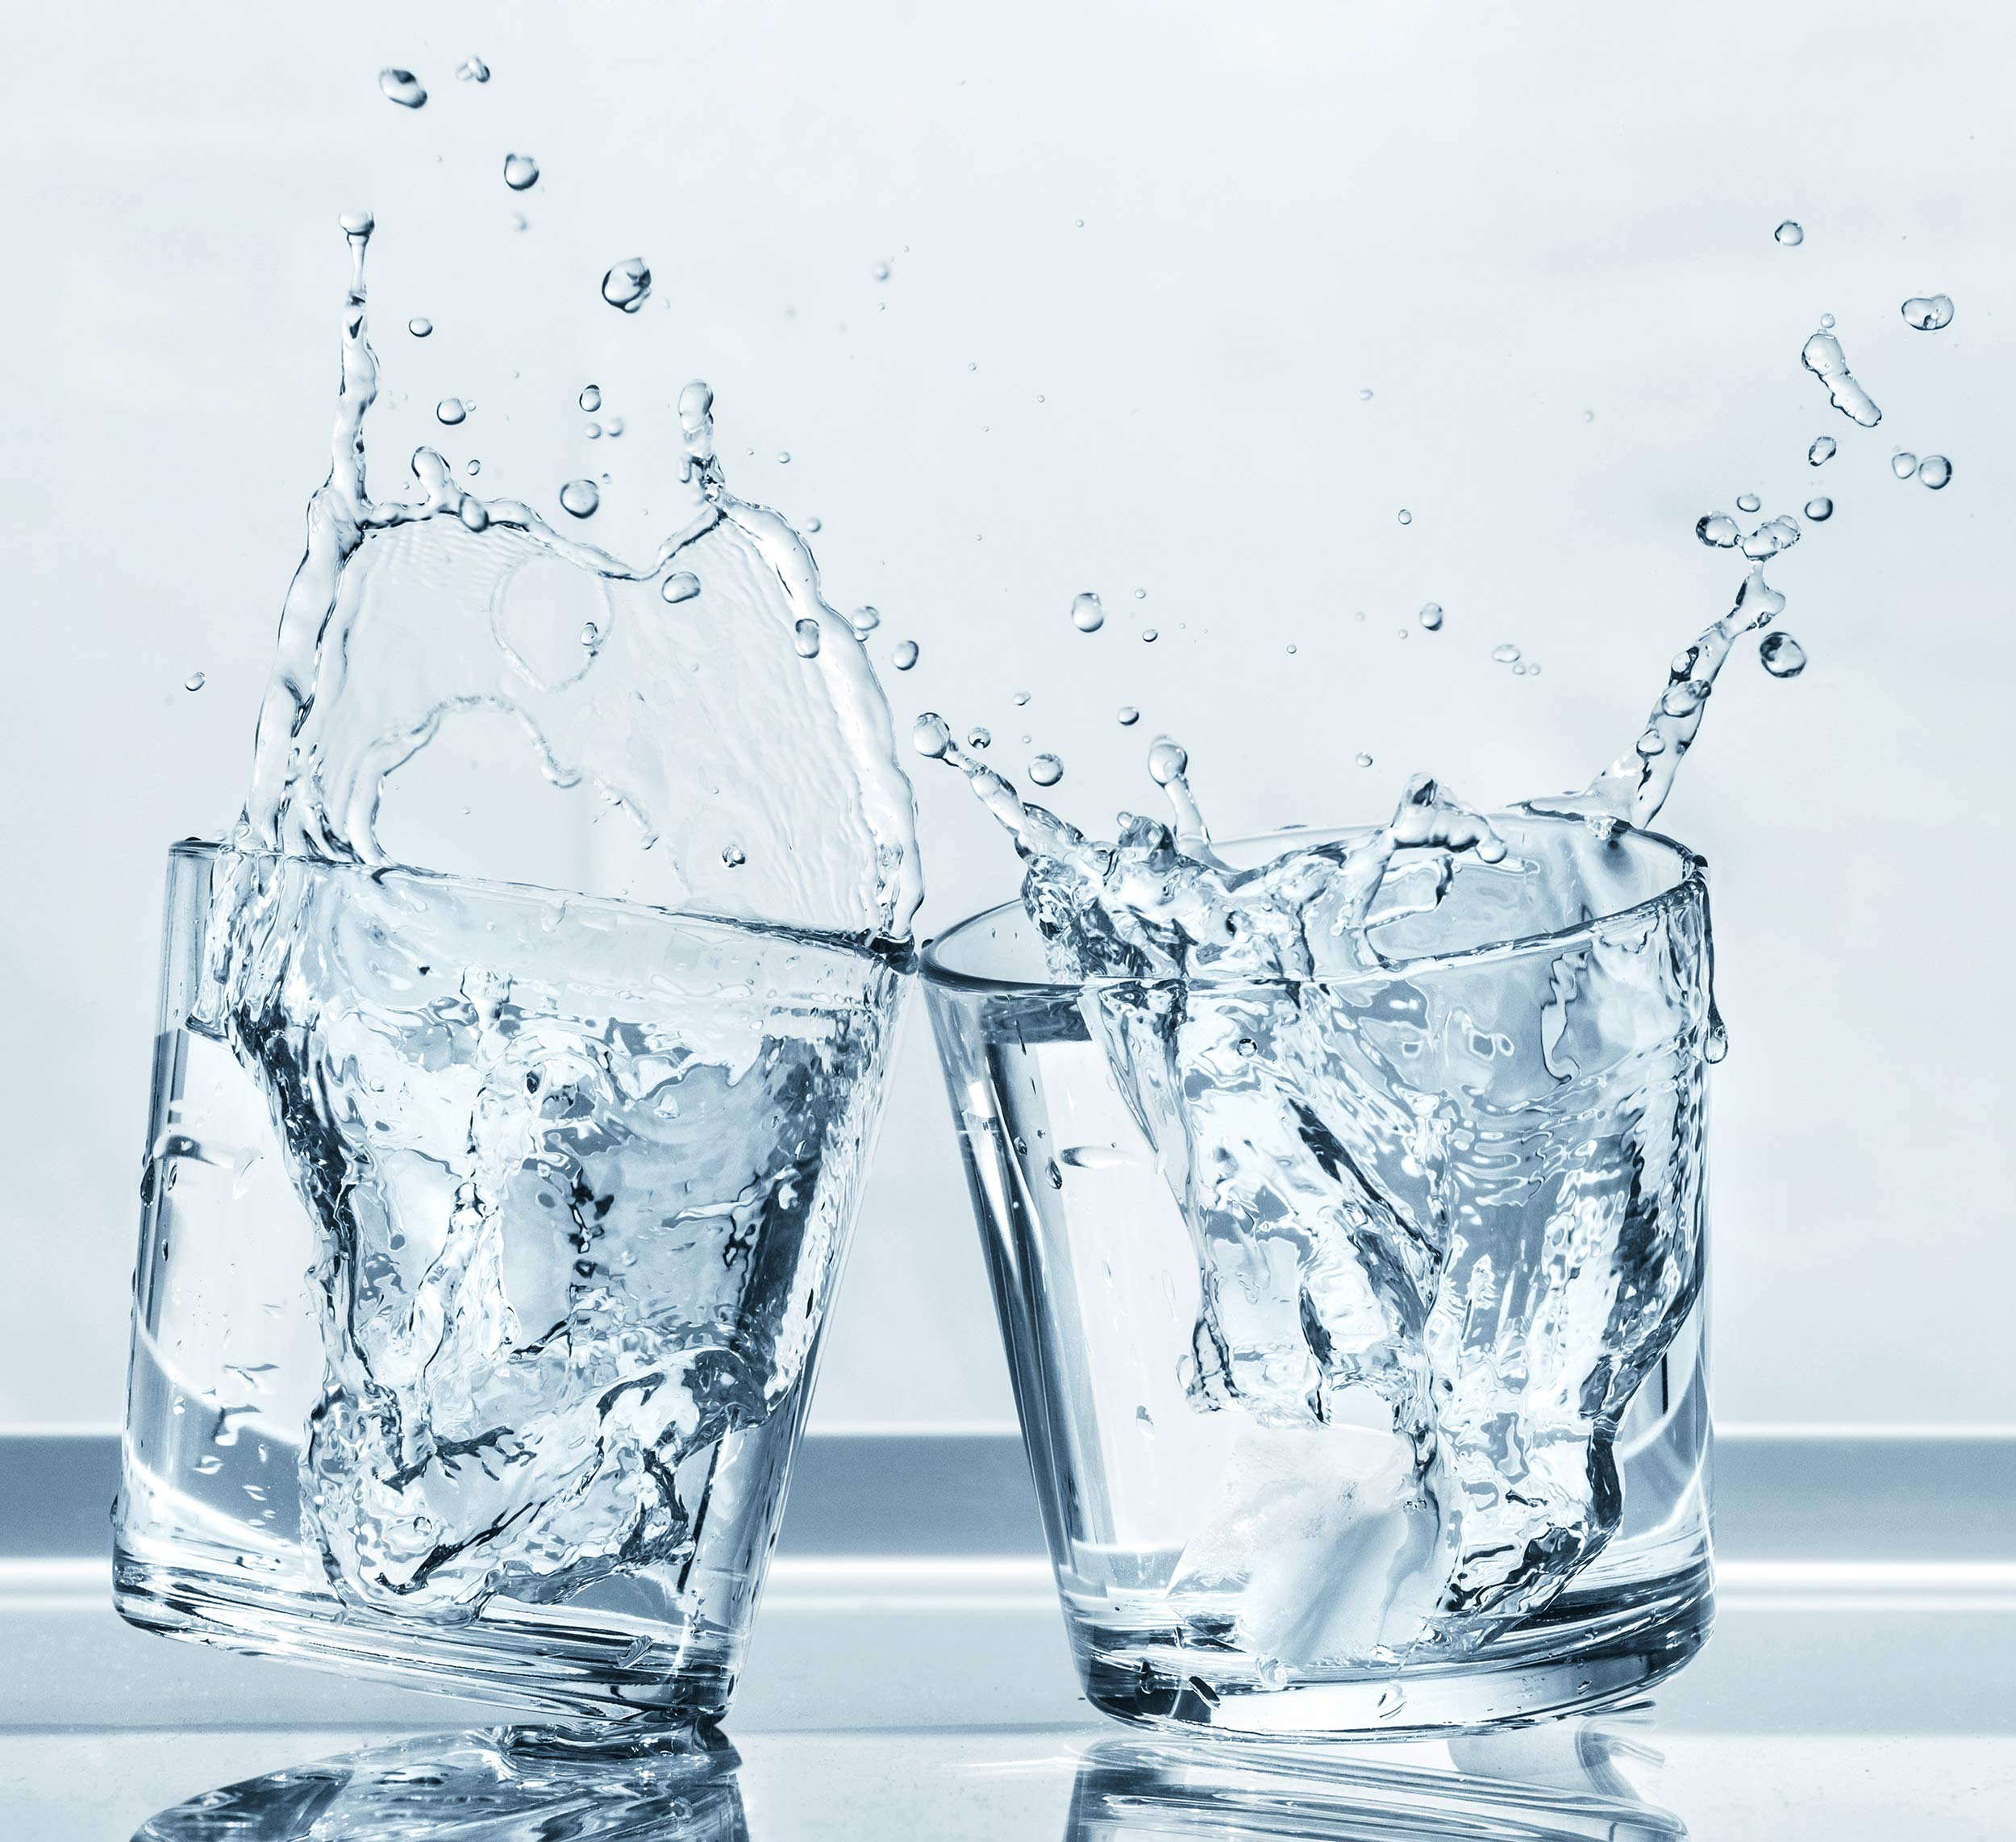 twoglasses.jpg